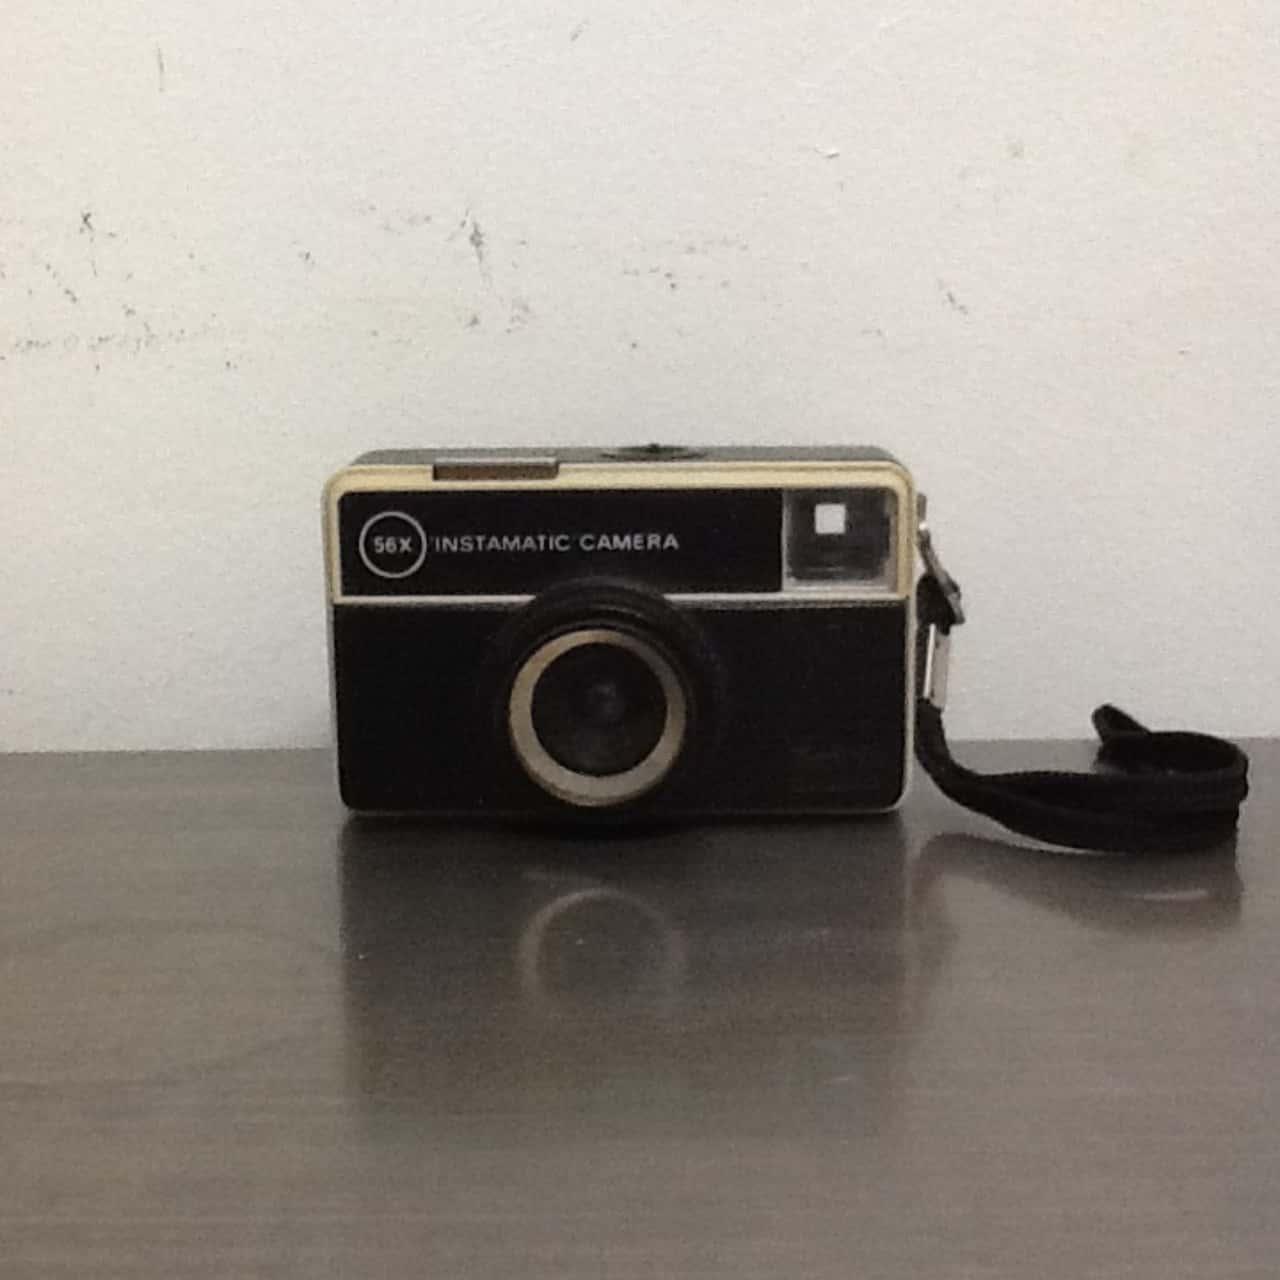 Kodak Instamatic 56-X